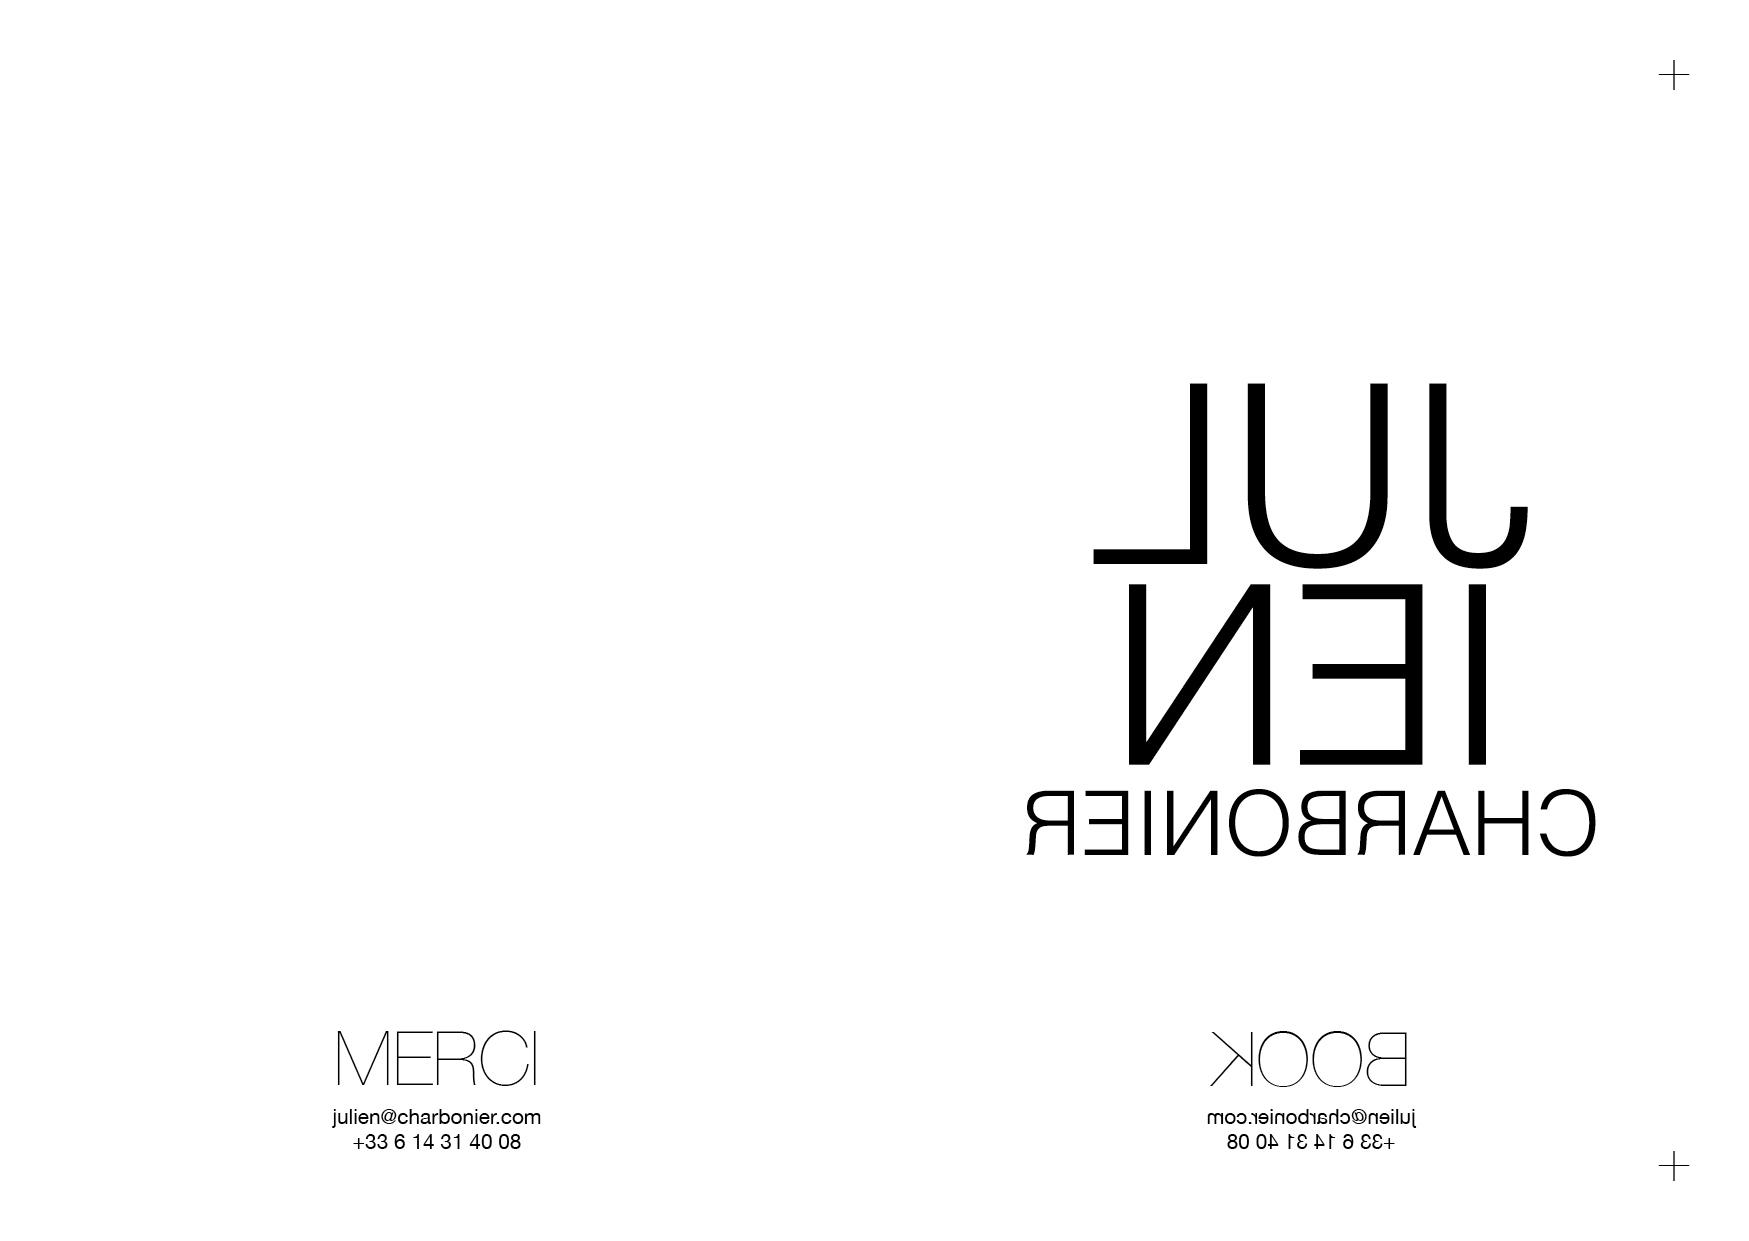 book julien charbonier MARS 2016 BD3